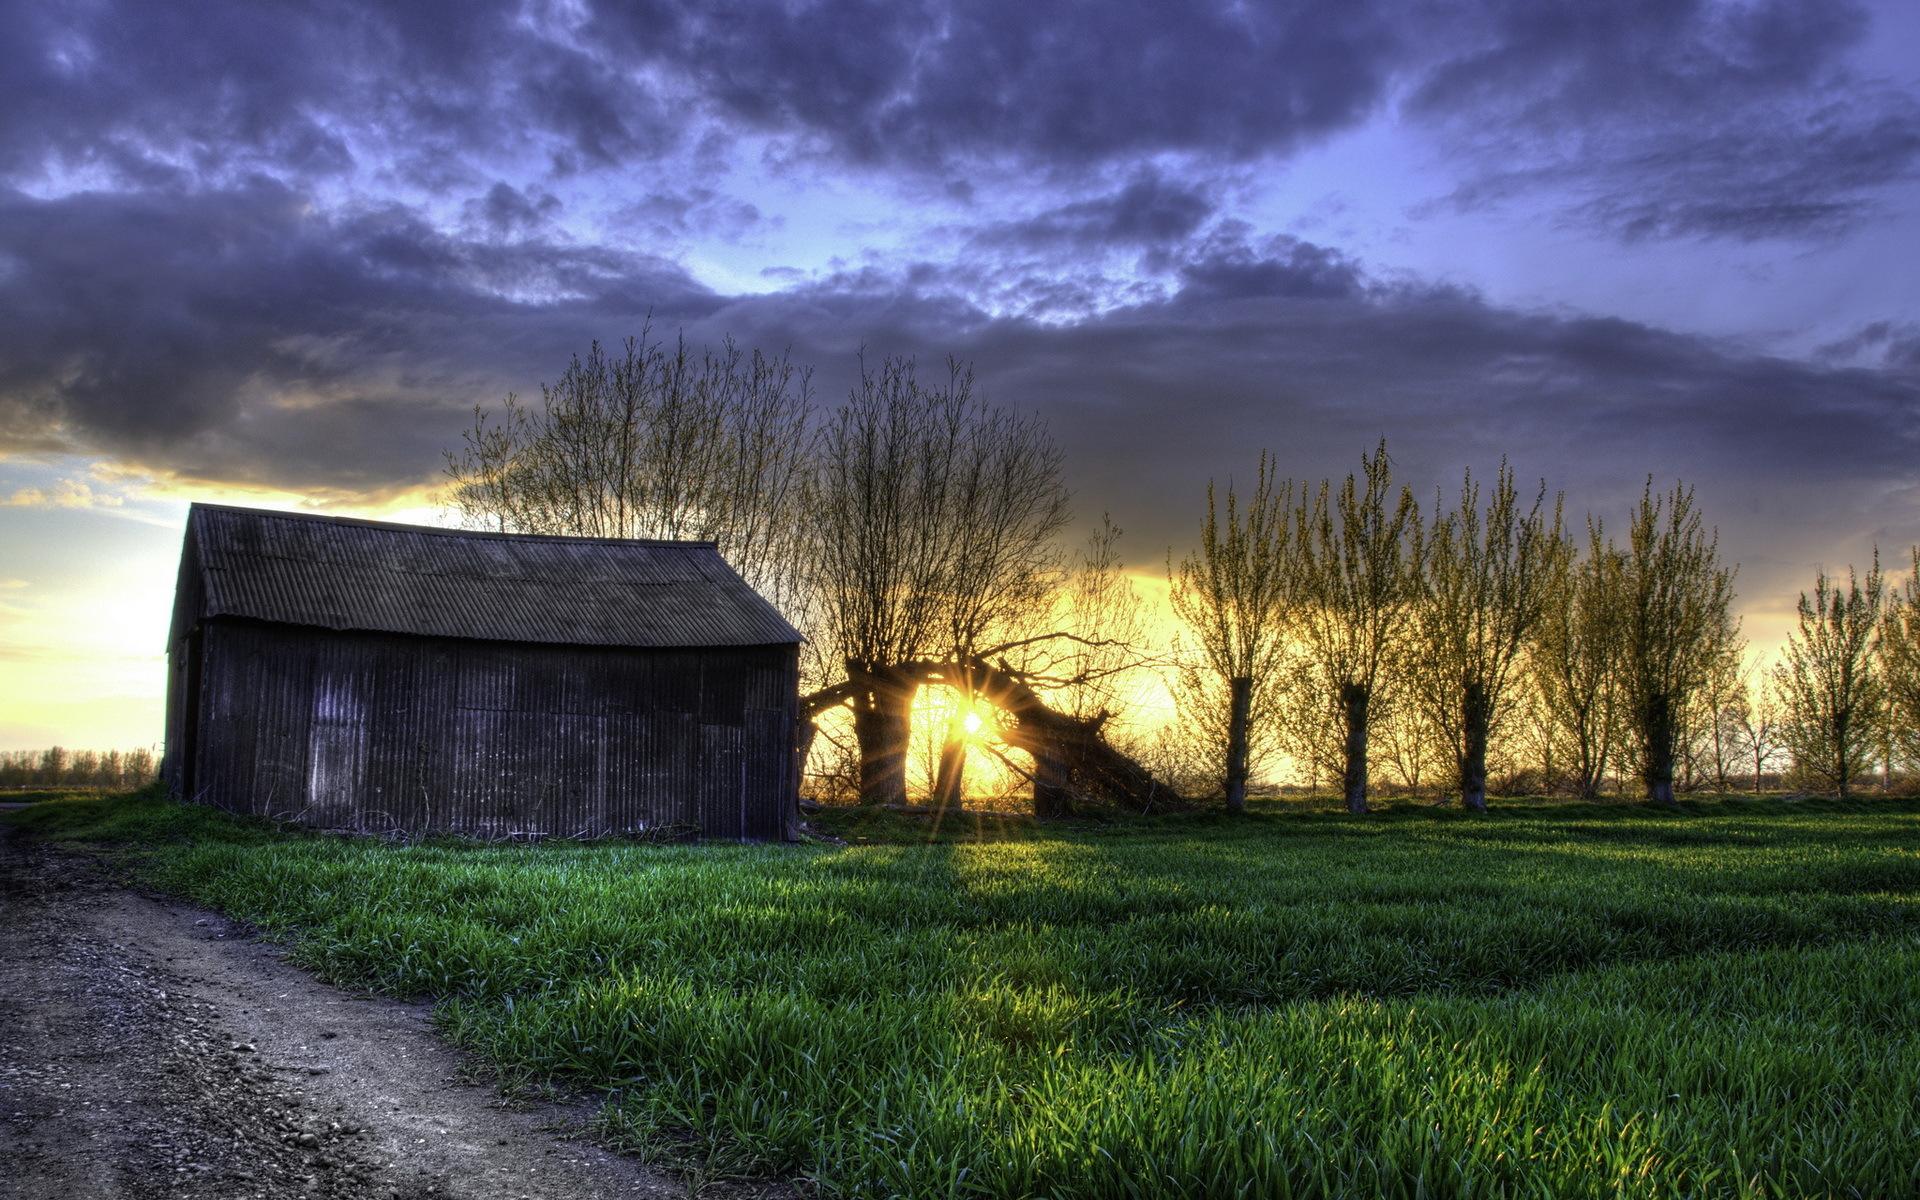 Картинки поле, трава, ночь, сарай, HDR фото и обои на рабочий стол